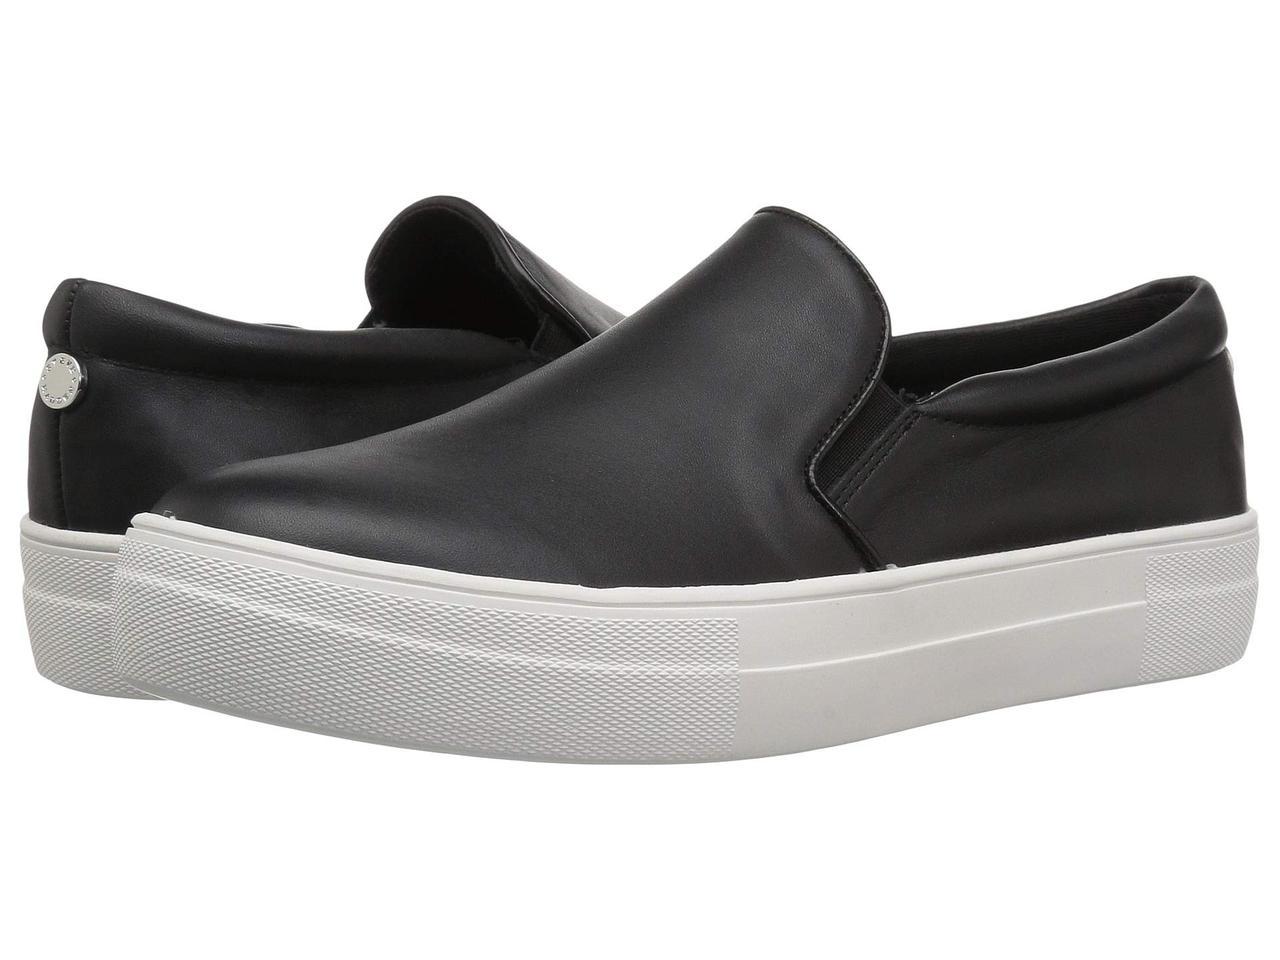 cb40228cc5f Кроссовки/Кеды (Оригинал) Steve Madden Gills Sneaker Black Leather